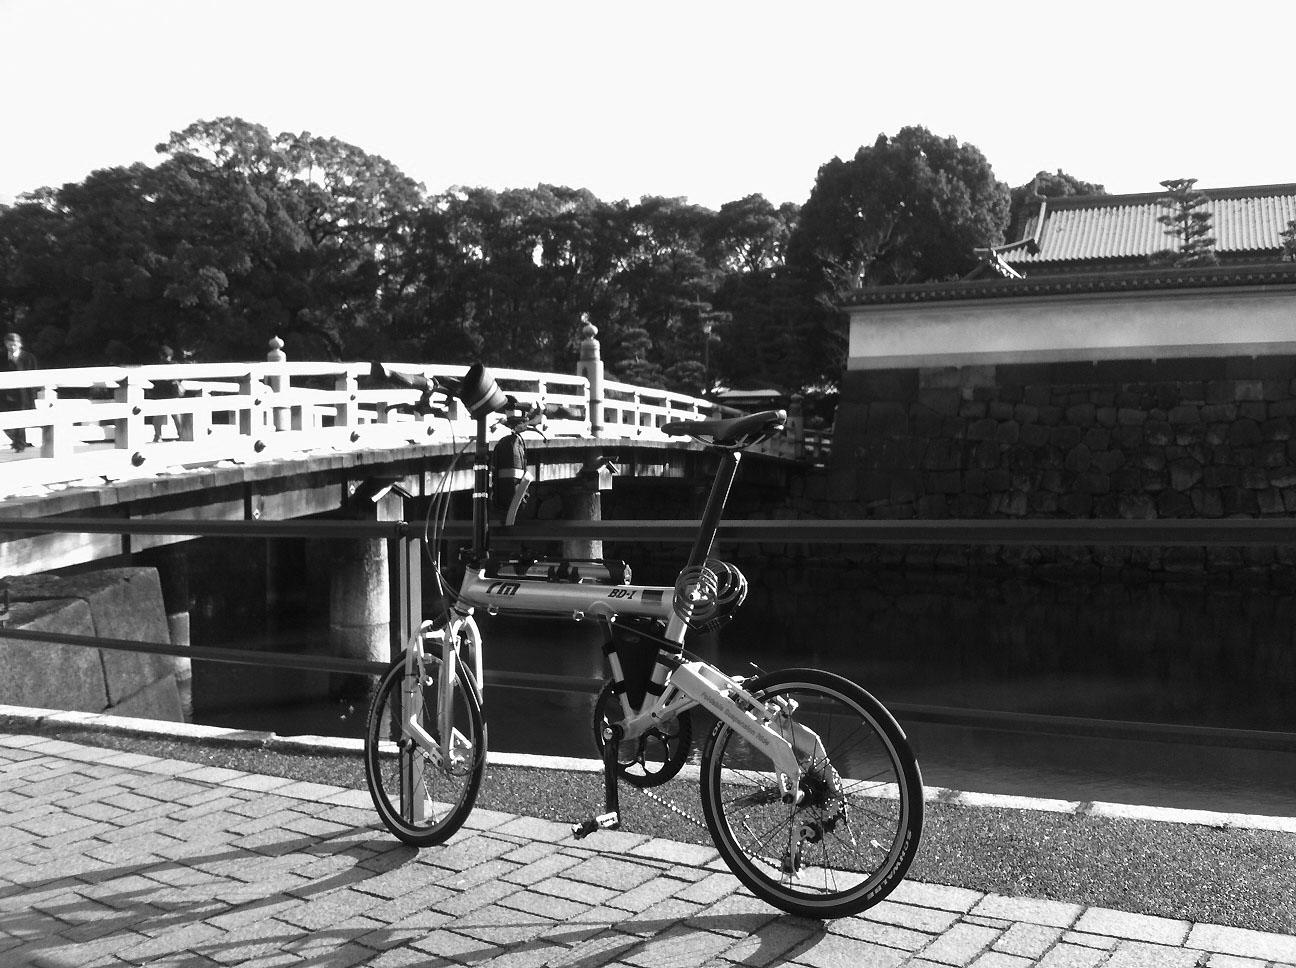 bd1_tokyo.jpg